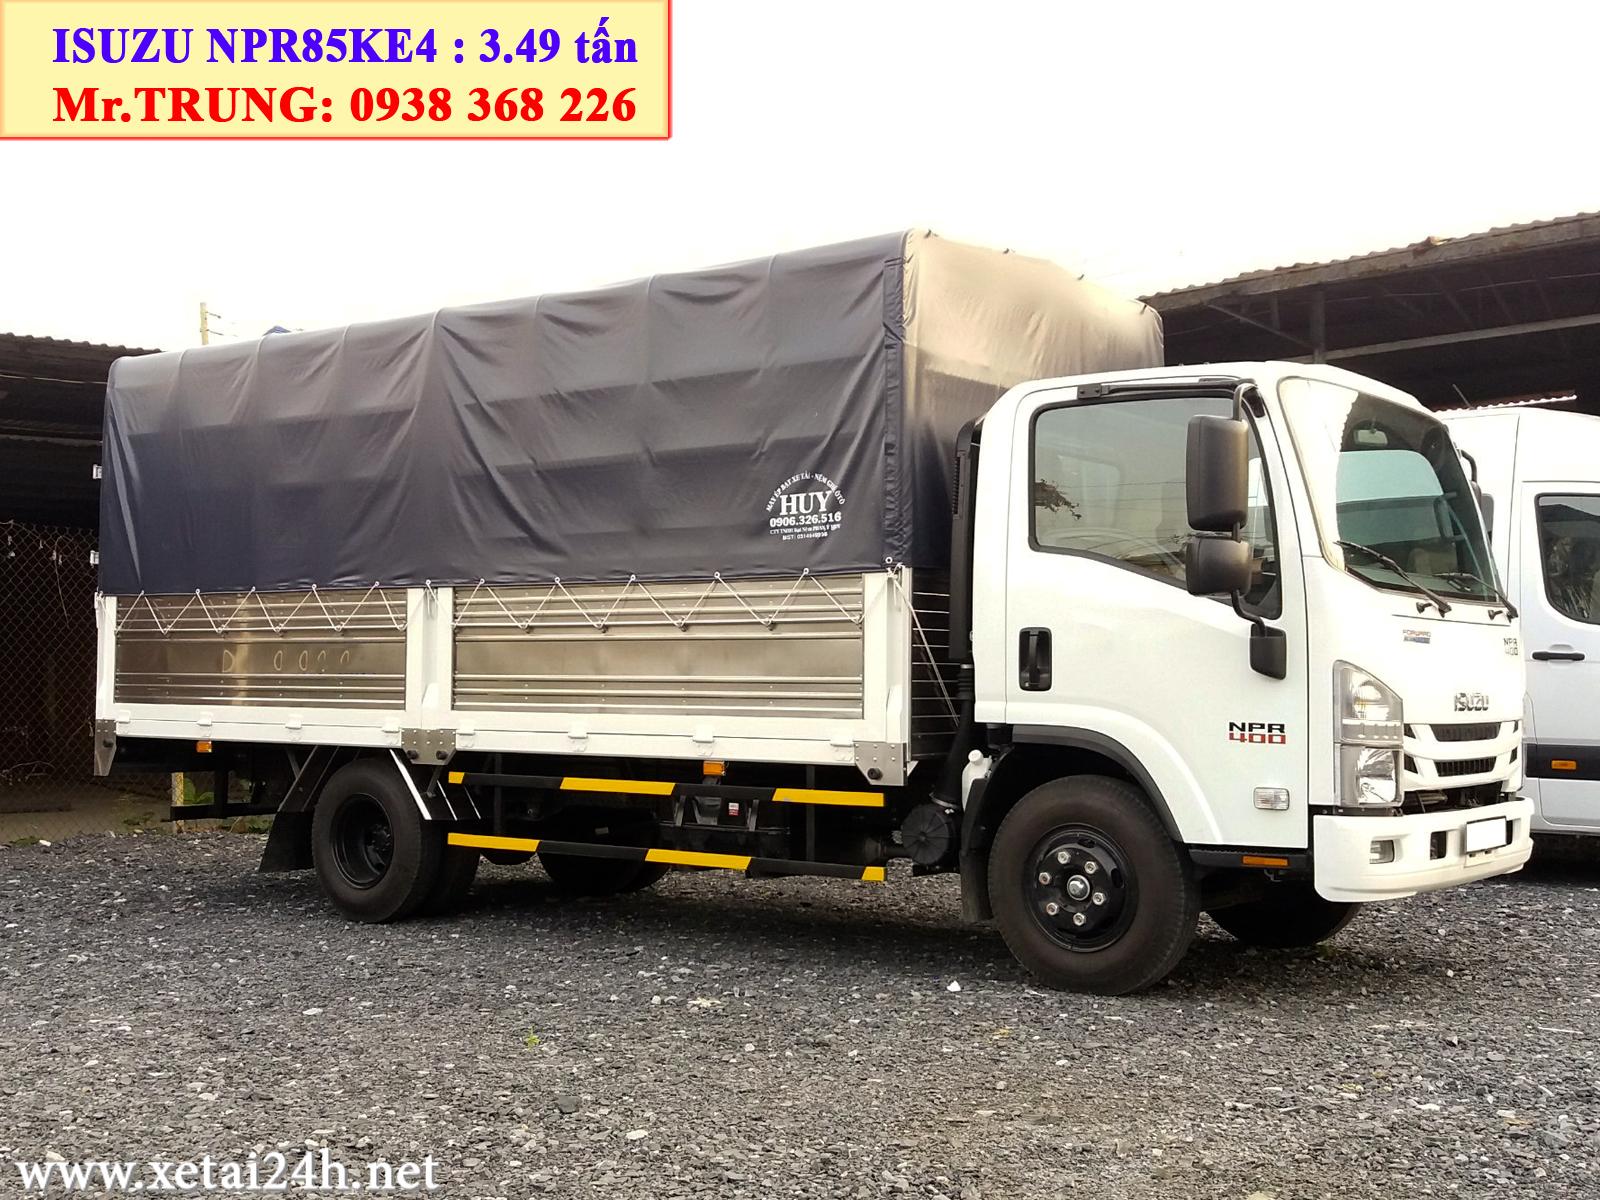 Xe tải Isuzu NPR85KE4 thùng mui bạt 5m2, tải trọng 3t5